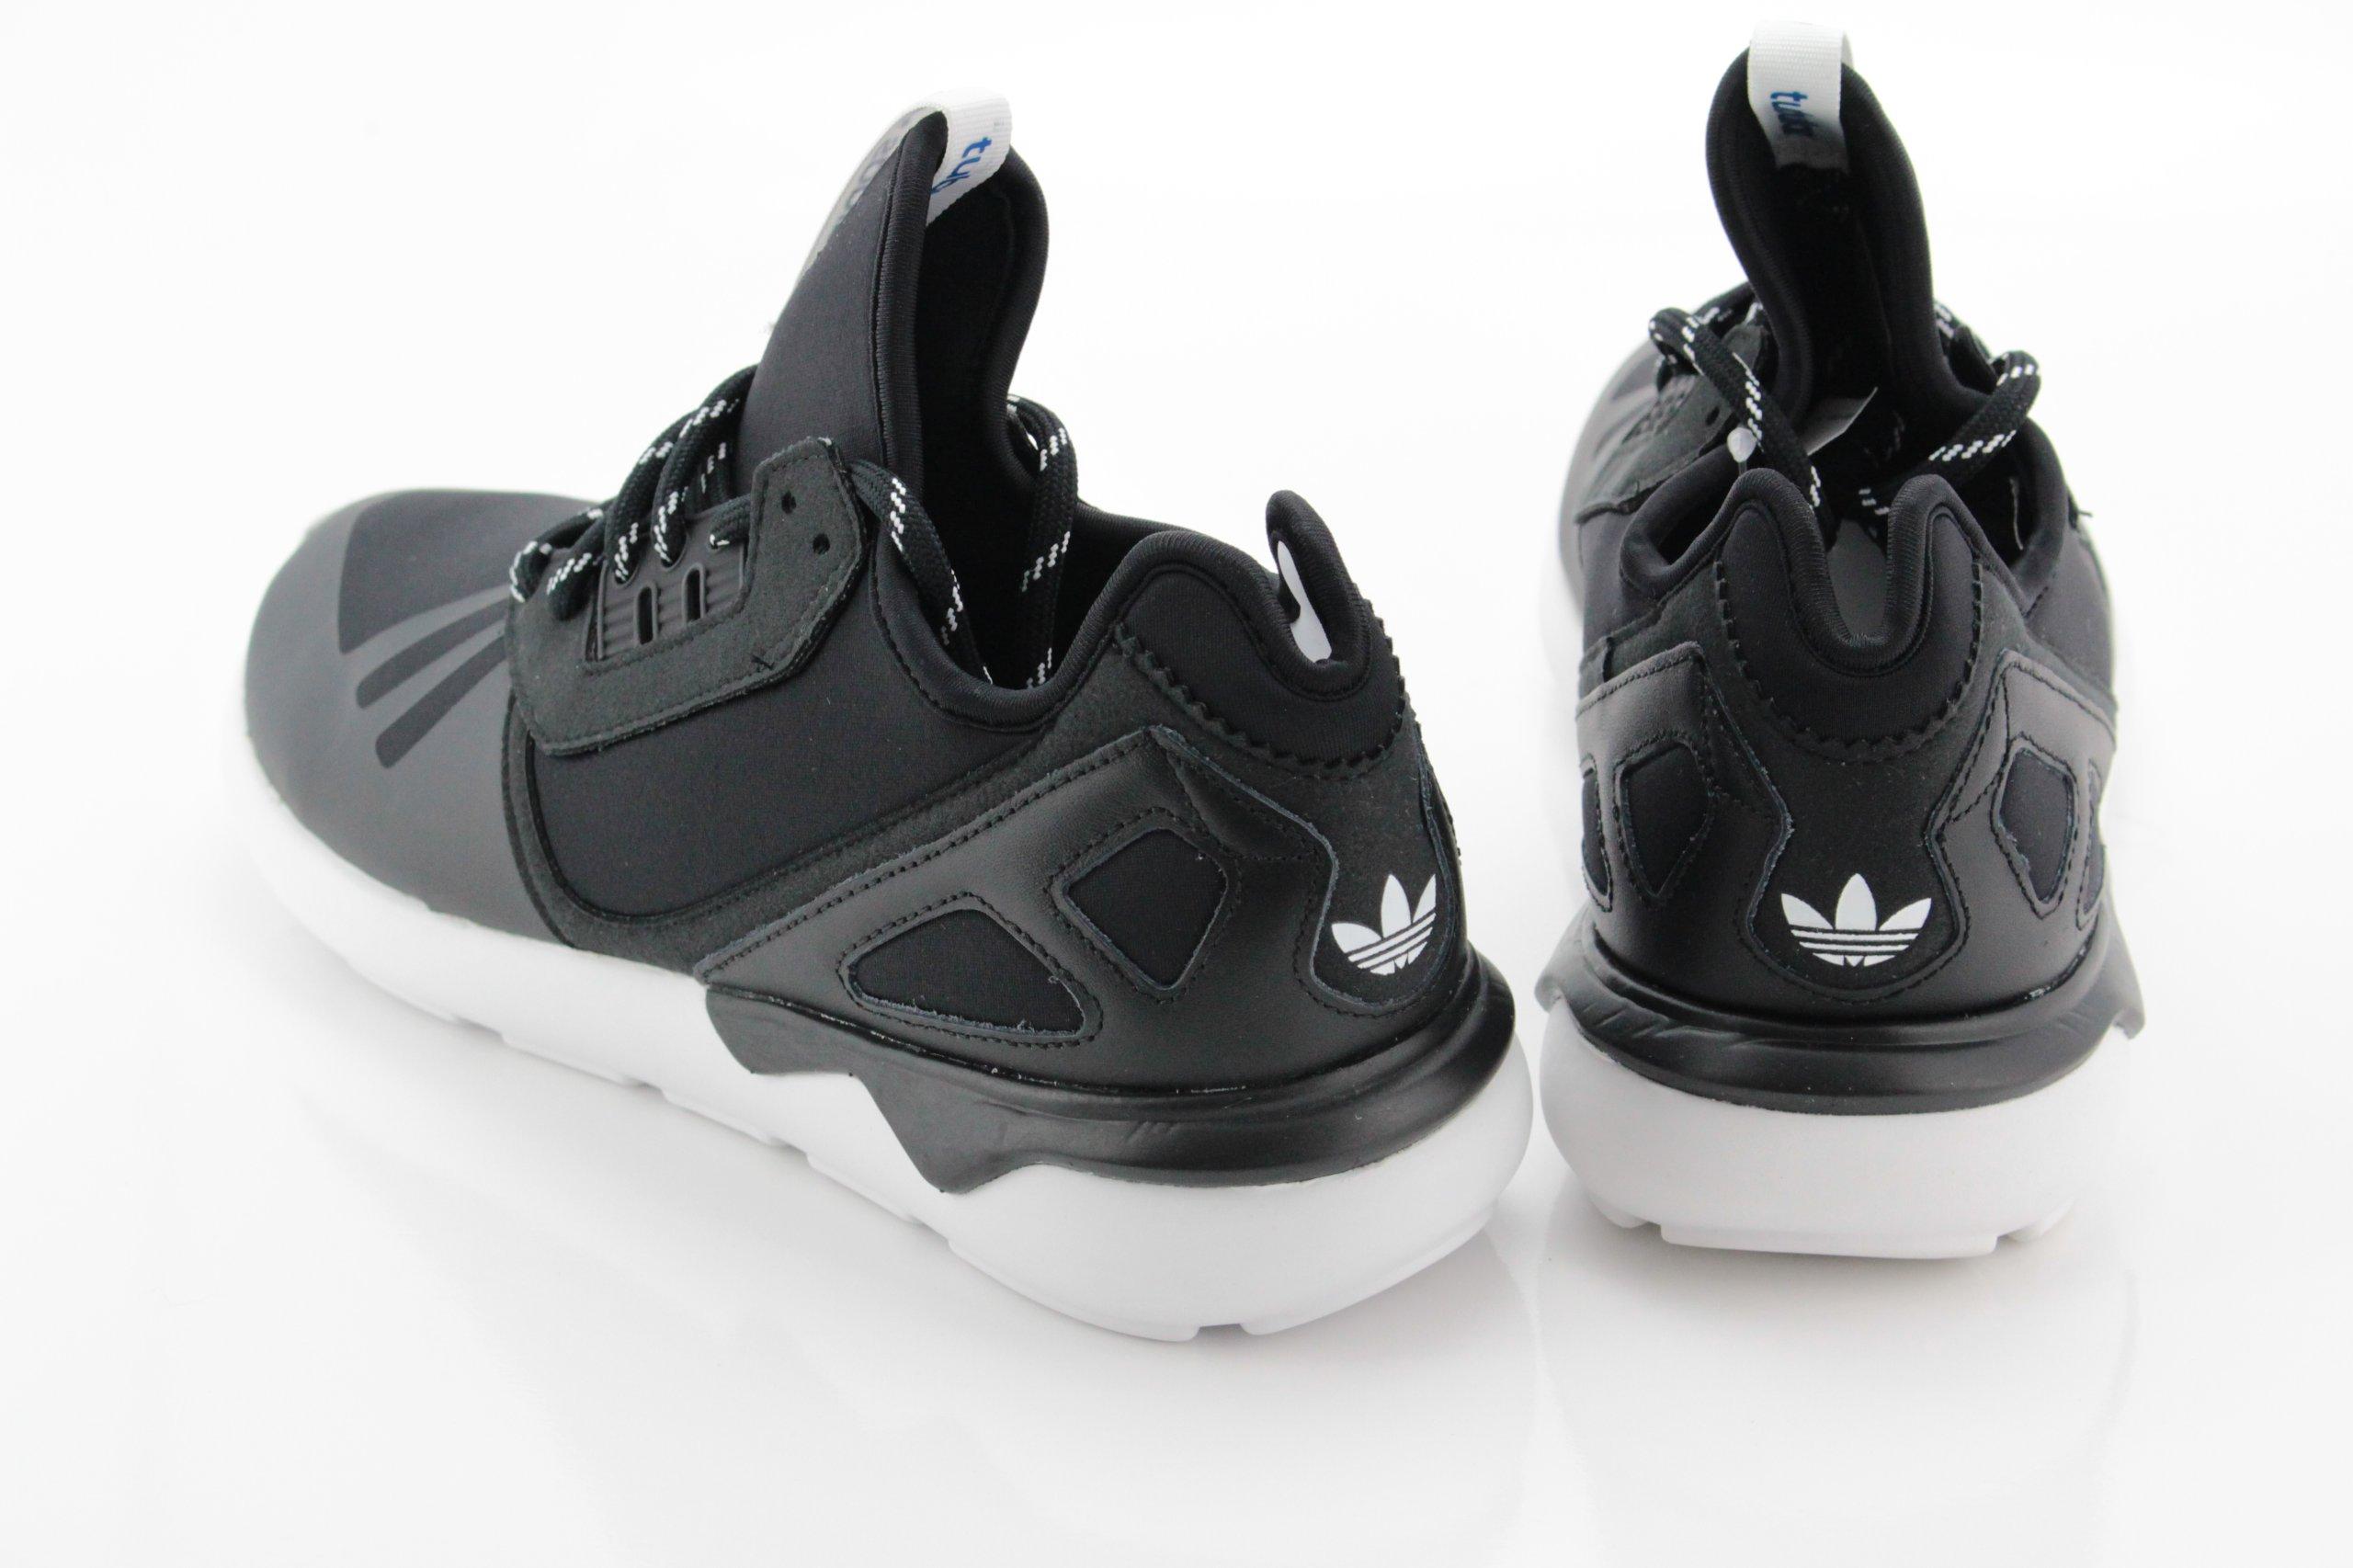 Buty męskie Adidas Tubular Runner M19648 42 D1